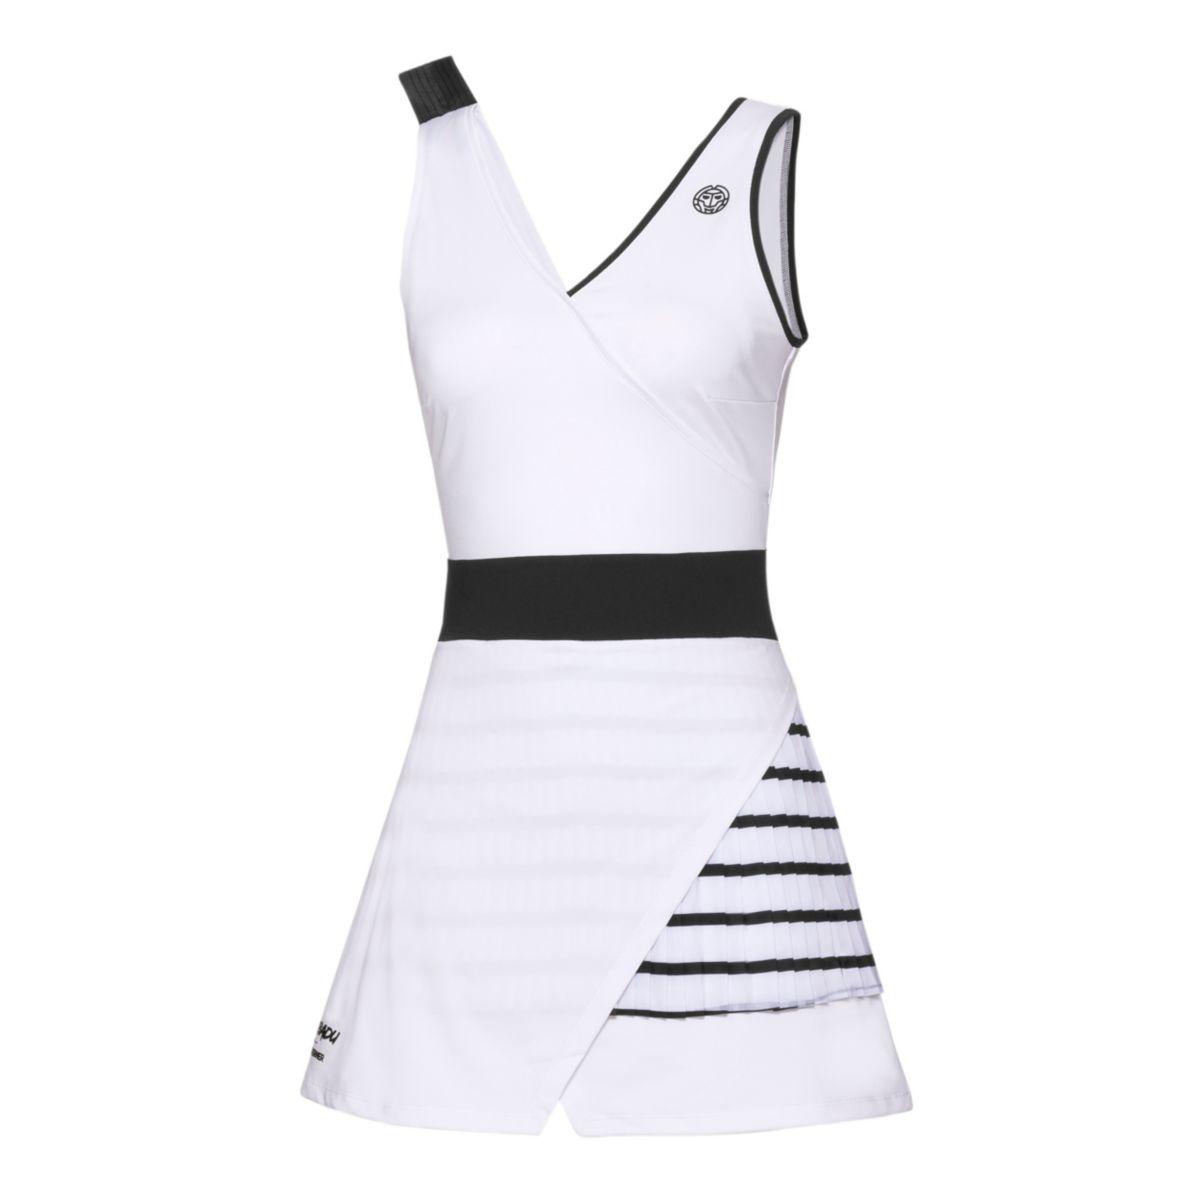 BIDI BADU Tennis-Kleid mit innovativem 3 in 1 S...